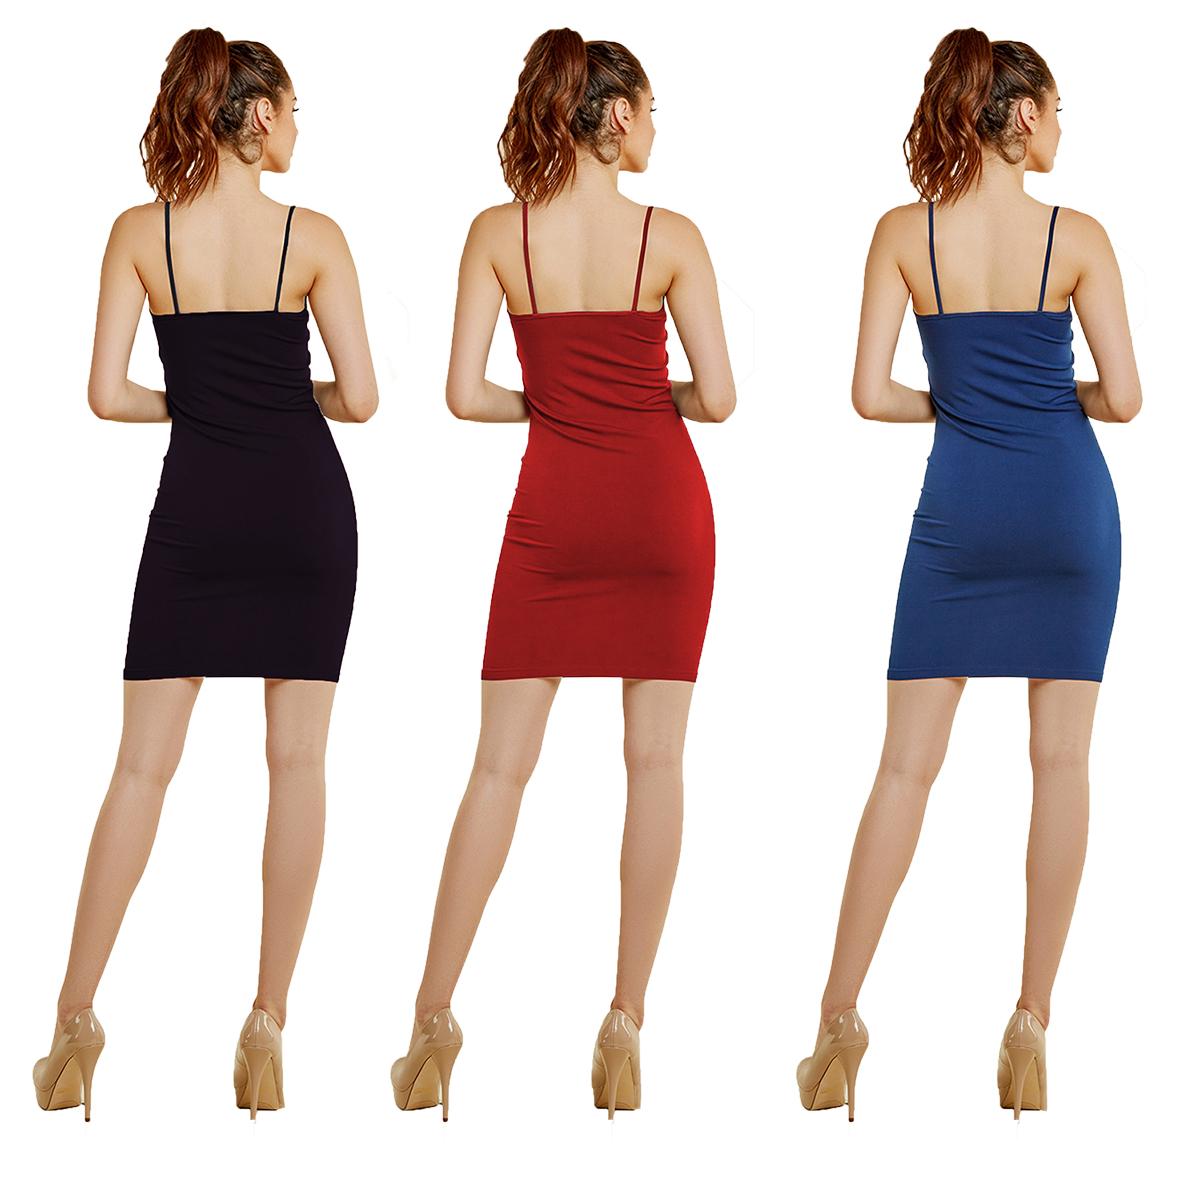 b09c98fbf2ea07 Women's 3 Pack Seamless Camisole Tank Slip Dress Sexy Bodycon ...